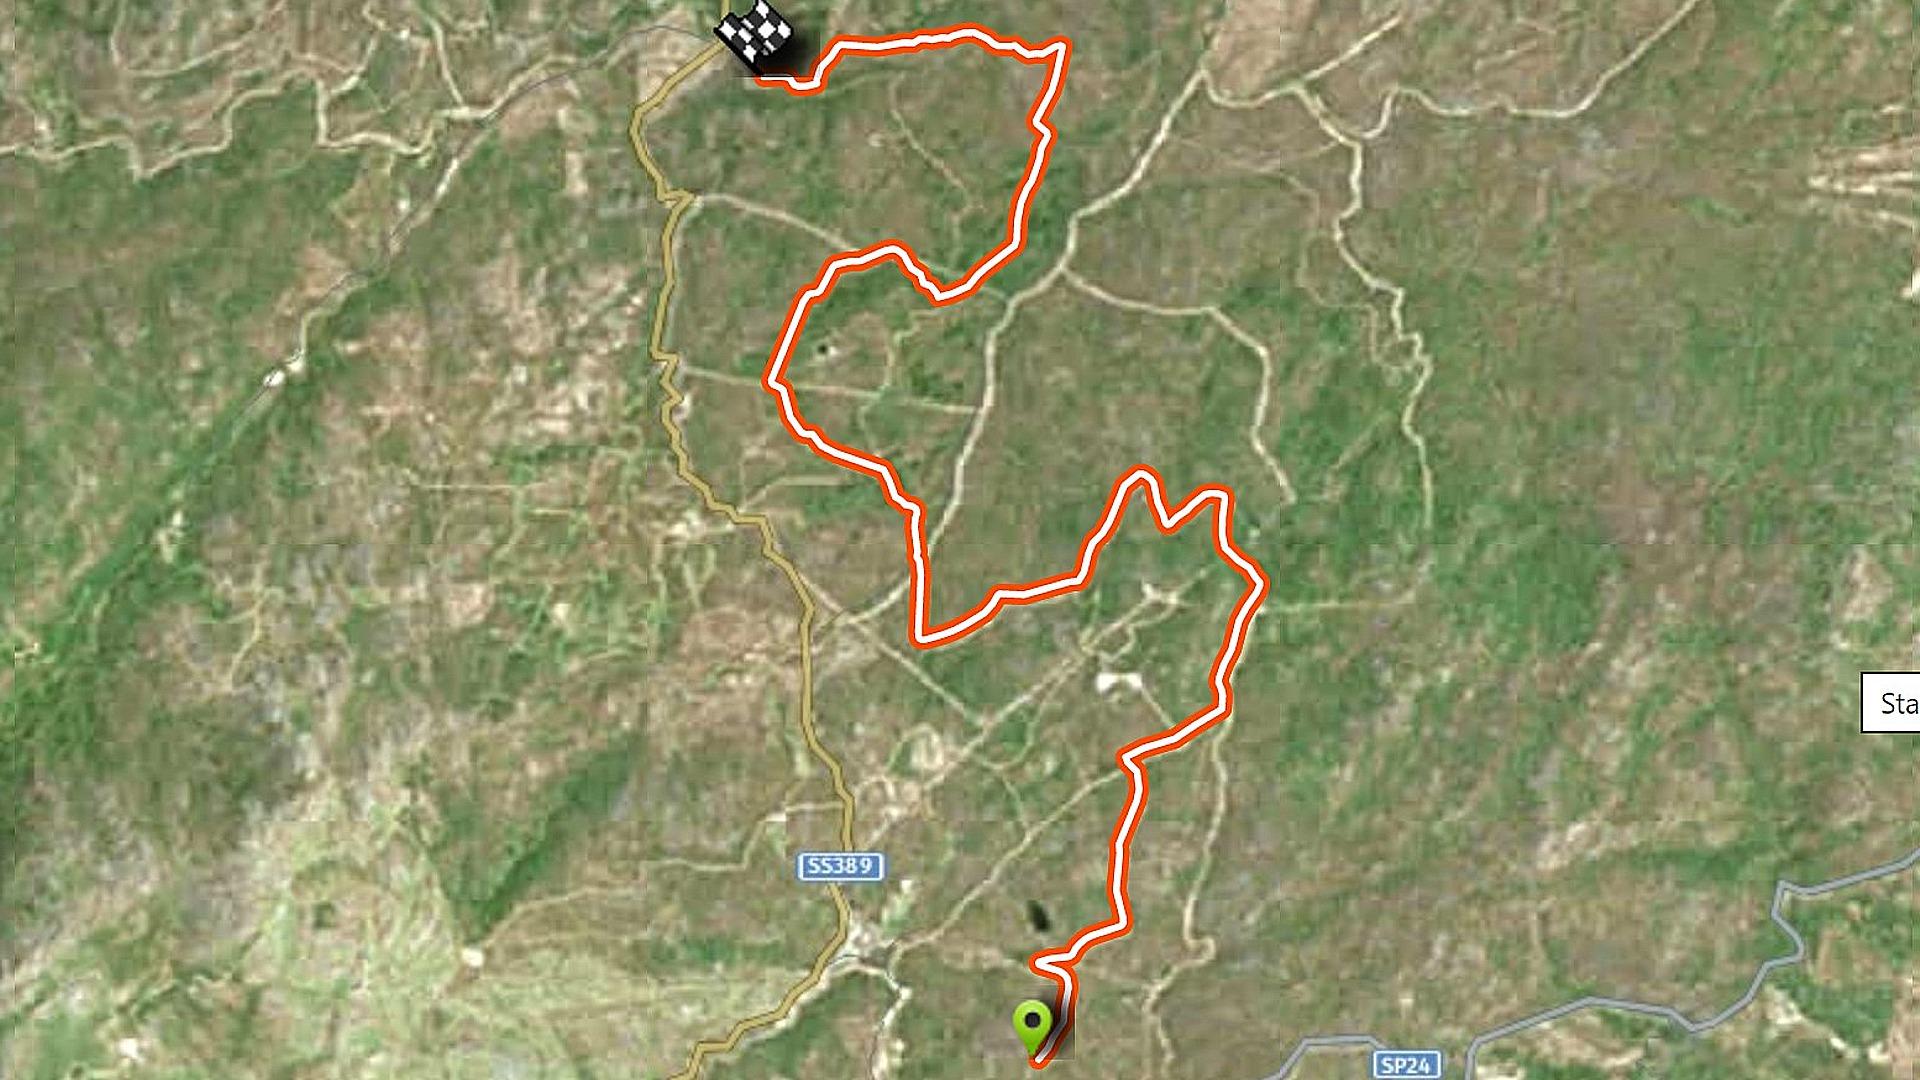 WRC: Rally d'Italia - Sardegna [3-6 Junio] - Página 3 040621_WRC-SS2-SS4-Italy-2021